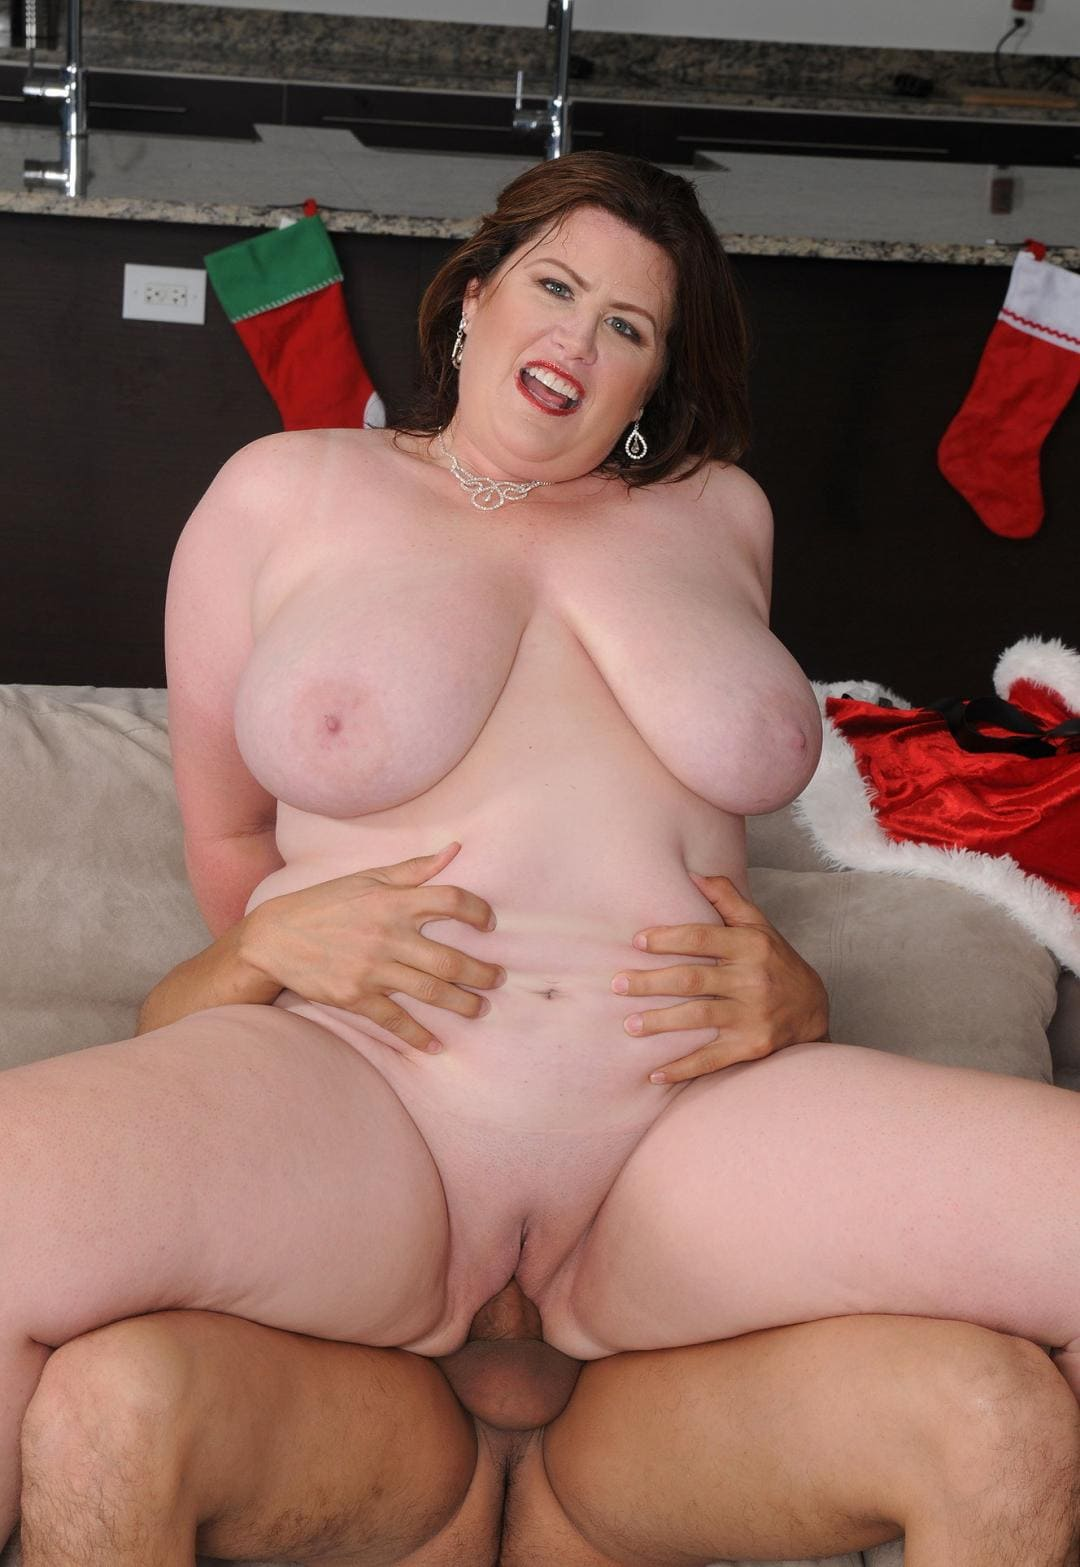 Лиза Спаркс порно фото голая сверху скачет на хую открыла ротик, яркий макияж